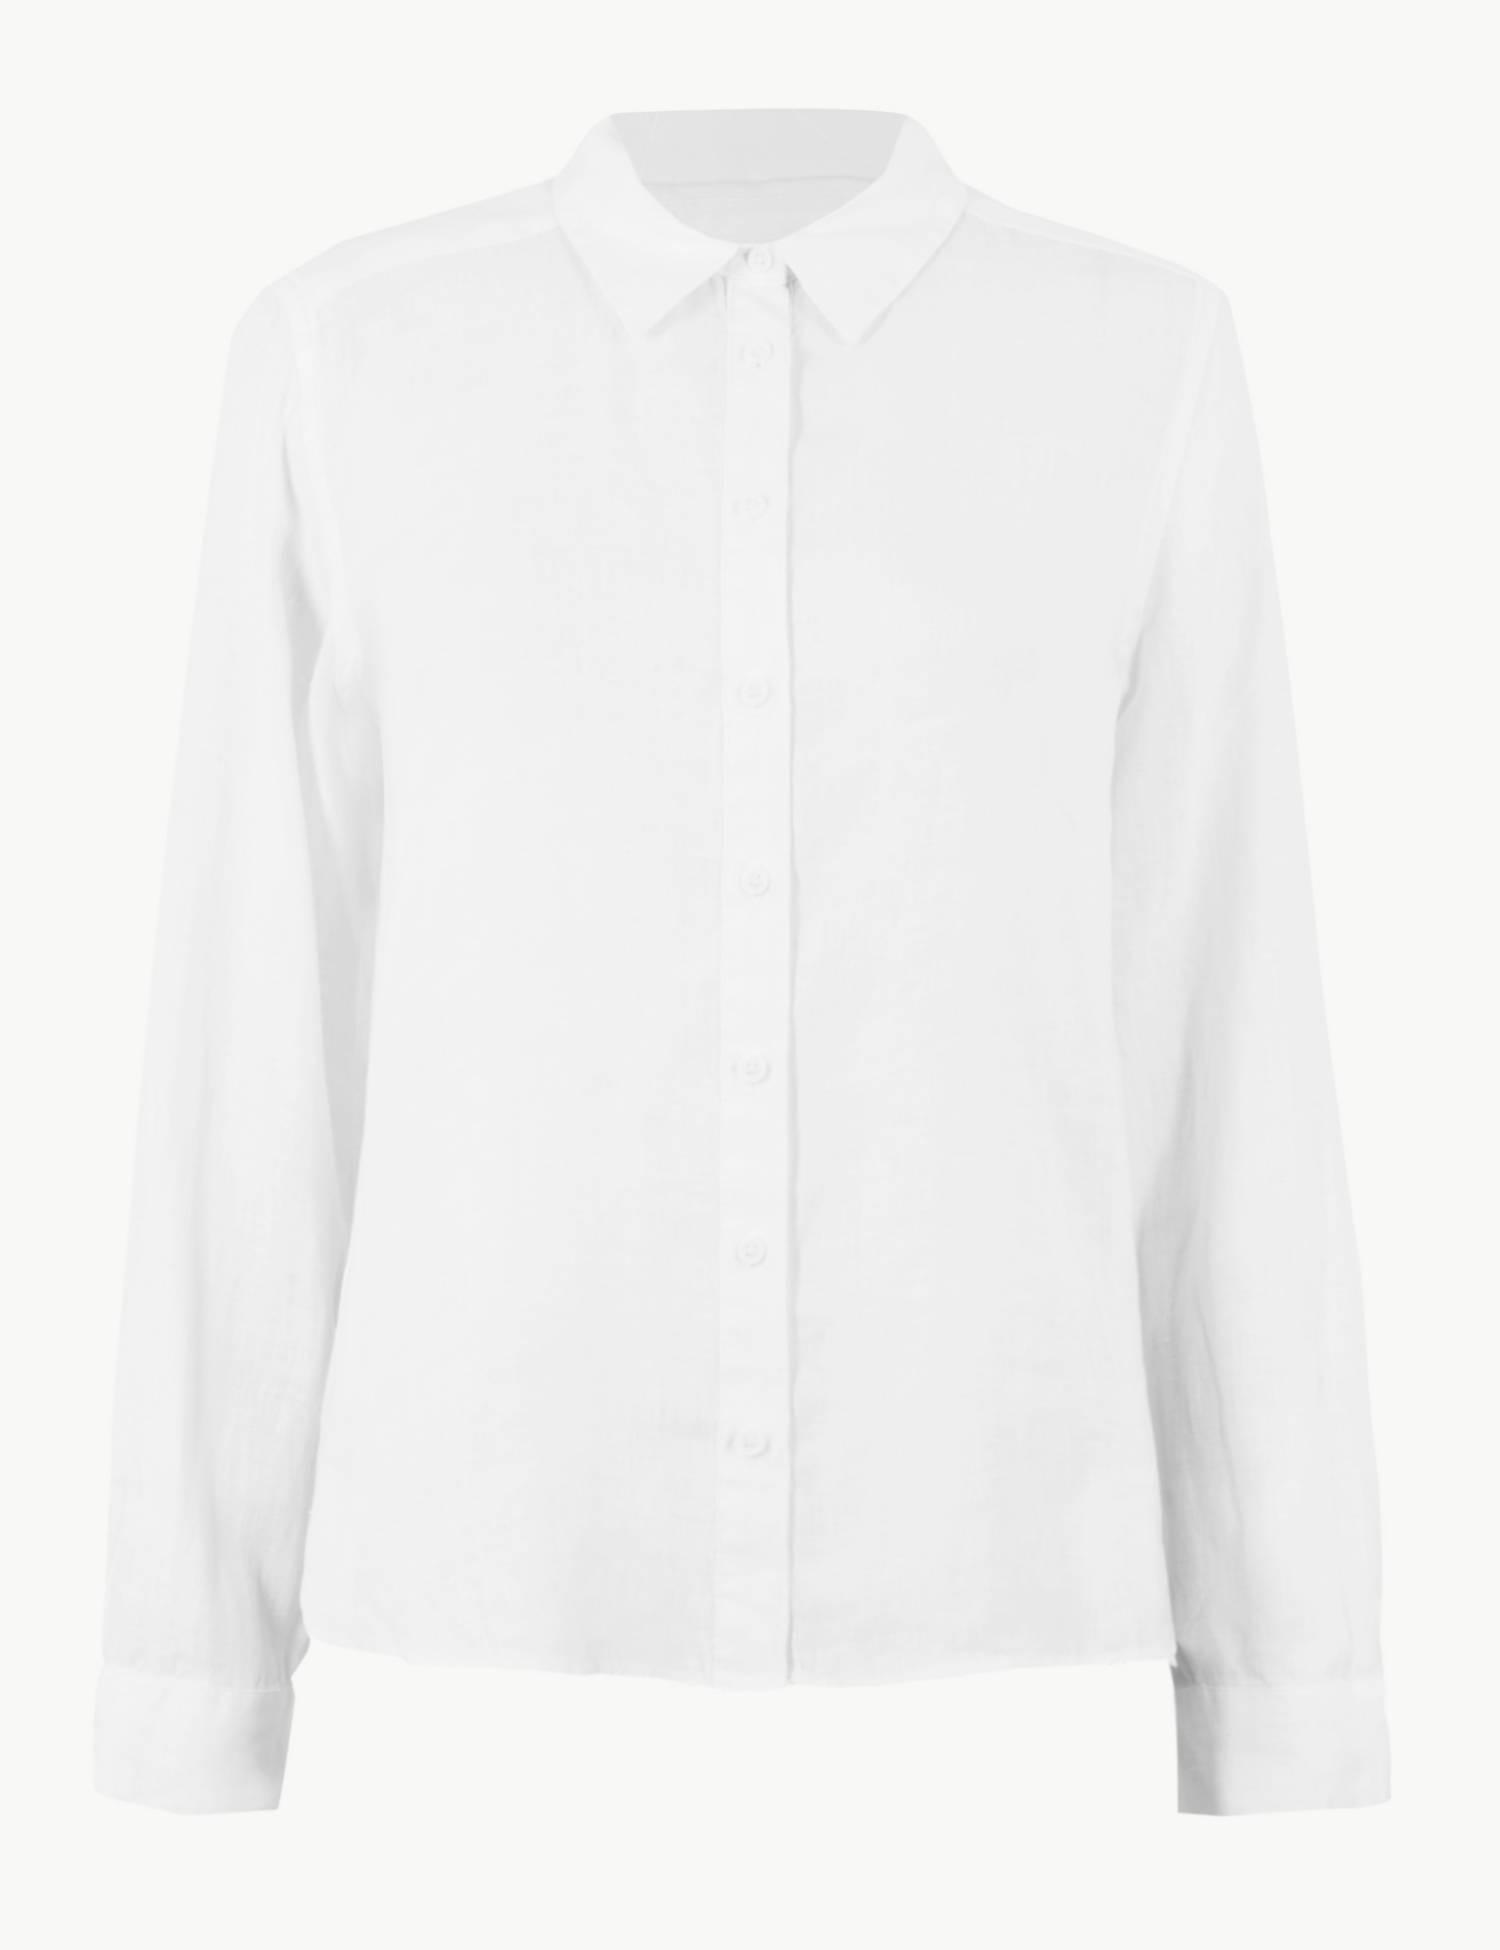 marks and spencer eco shirt.jpg